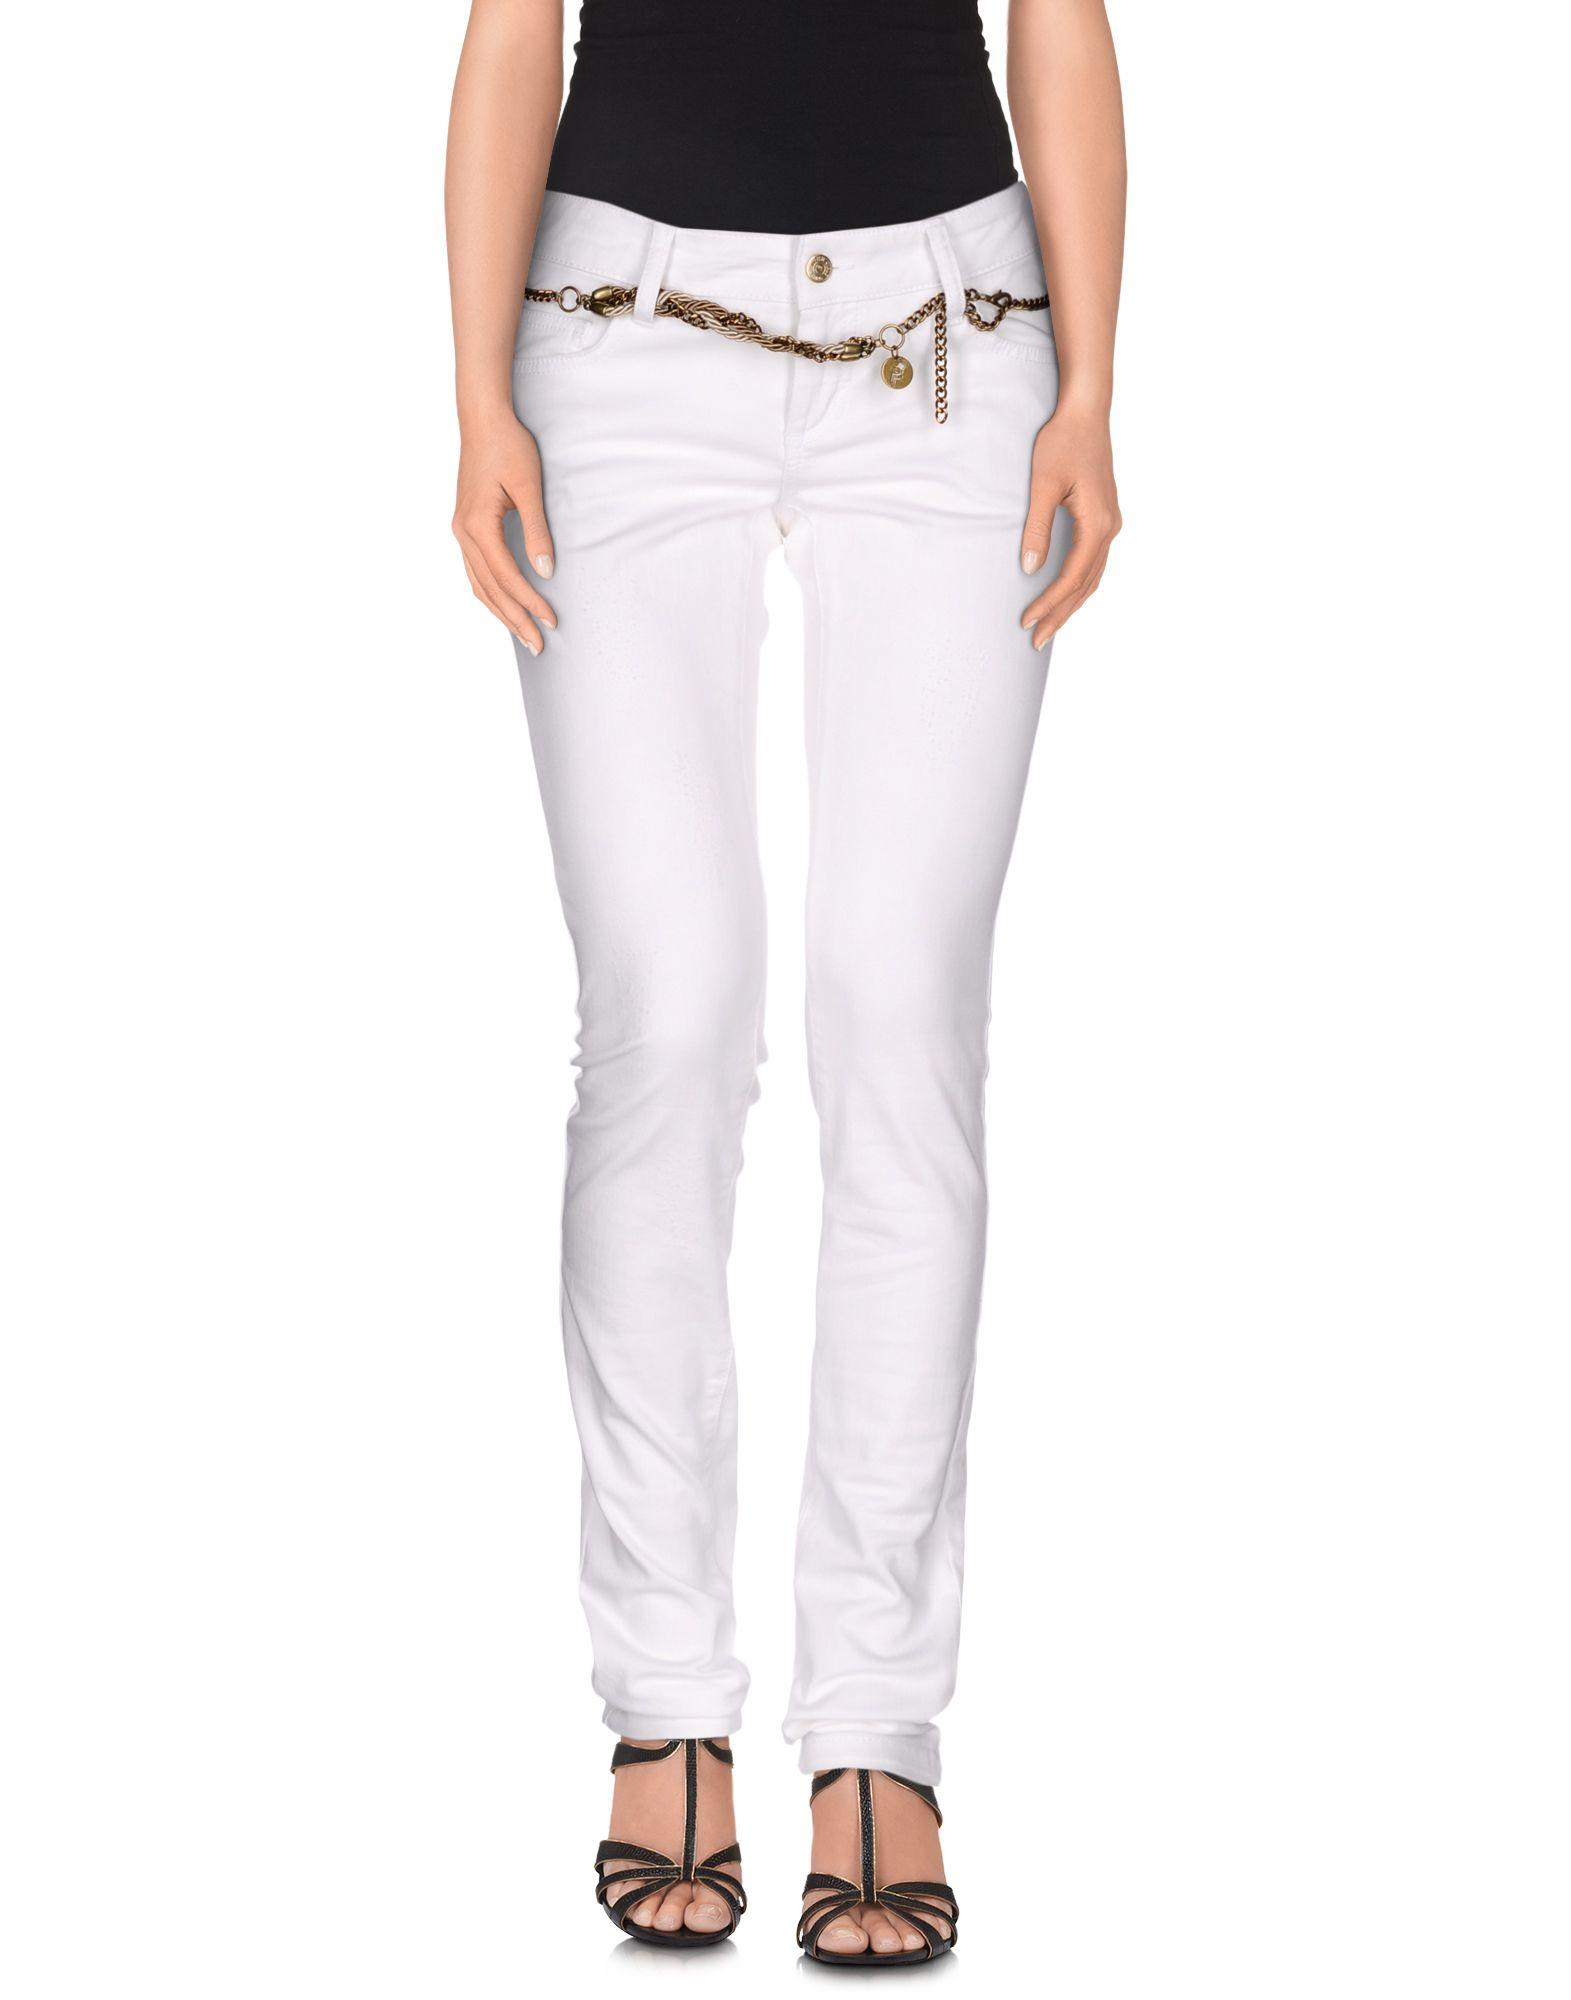 ONLY 4 STYLISH GIRLS by PATRIZIA PEPE Джинсовые брюки